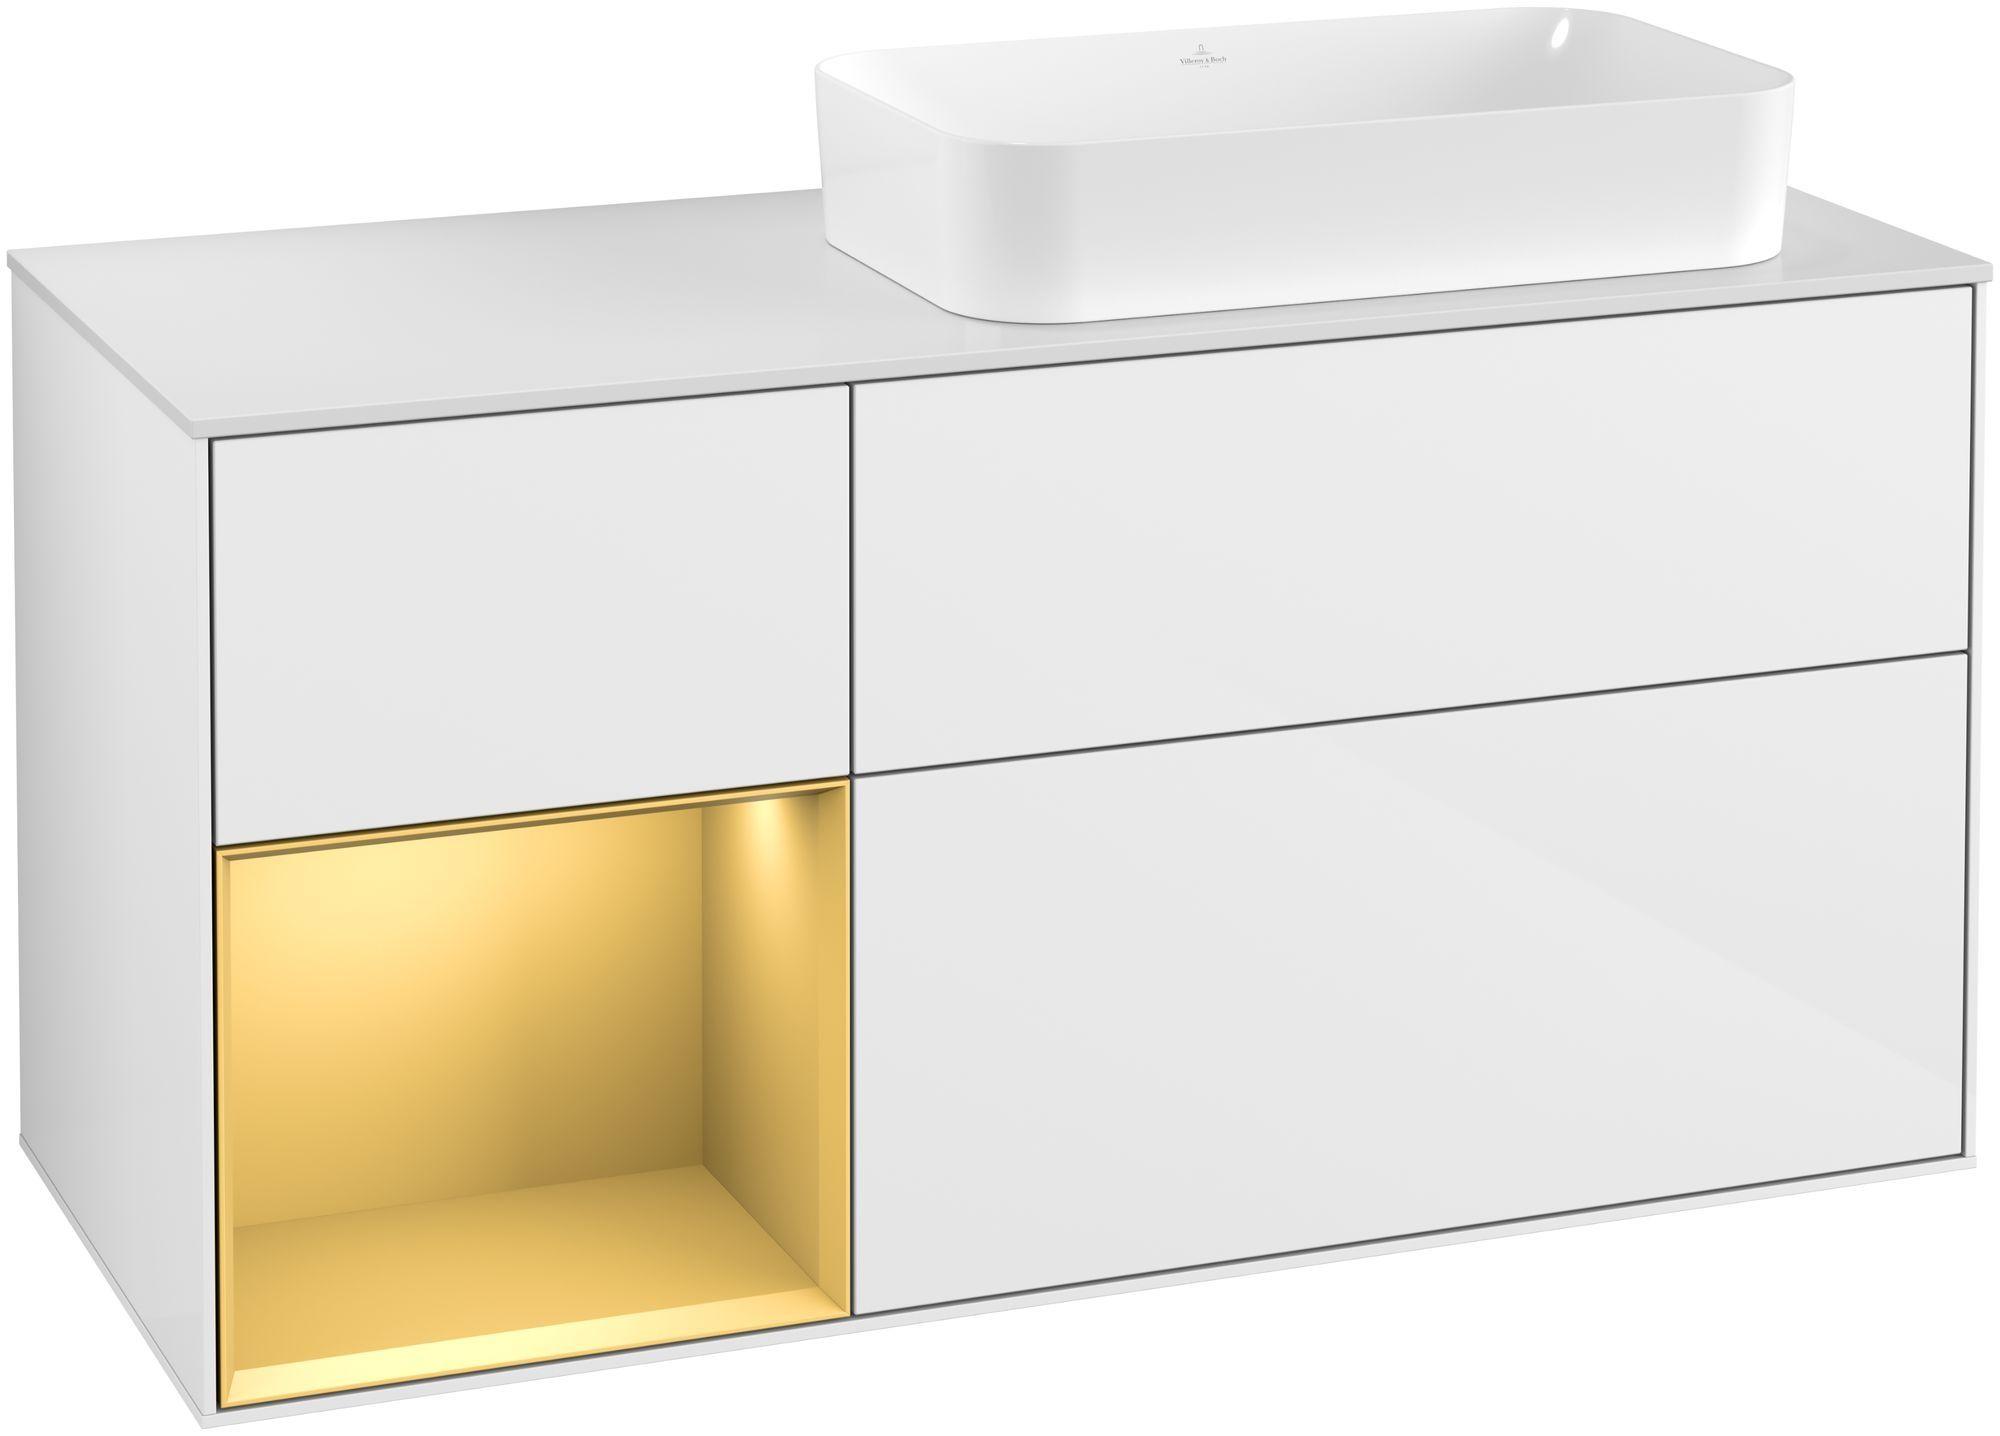 Villeroy & Boch Finion F27 Waschtischunterschrank mit Regalelement 3 Auszüge Waschtisch rechts LED-Beleuchtung B:120xH:60,3xT:50,1cm Front, Korpus: Glossy White Lack, Regal: Gold Matt, Glasplatte: White Matt F271HFGF